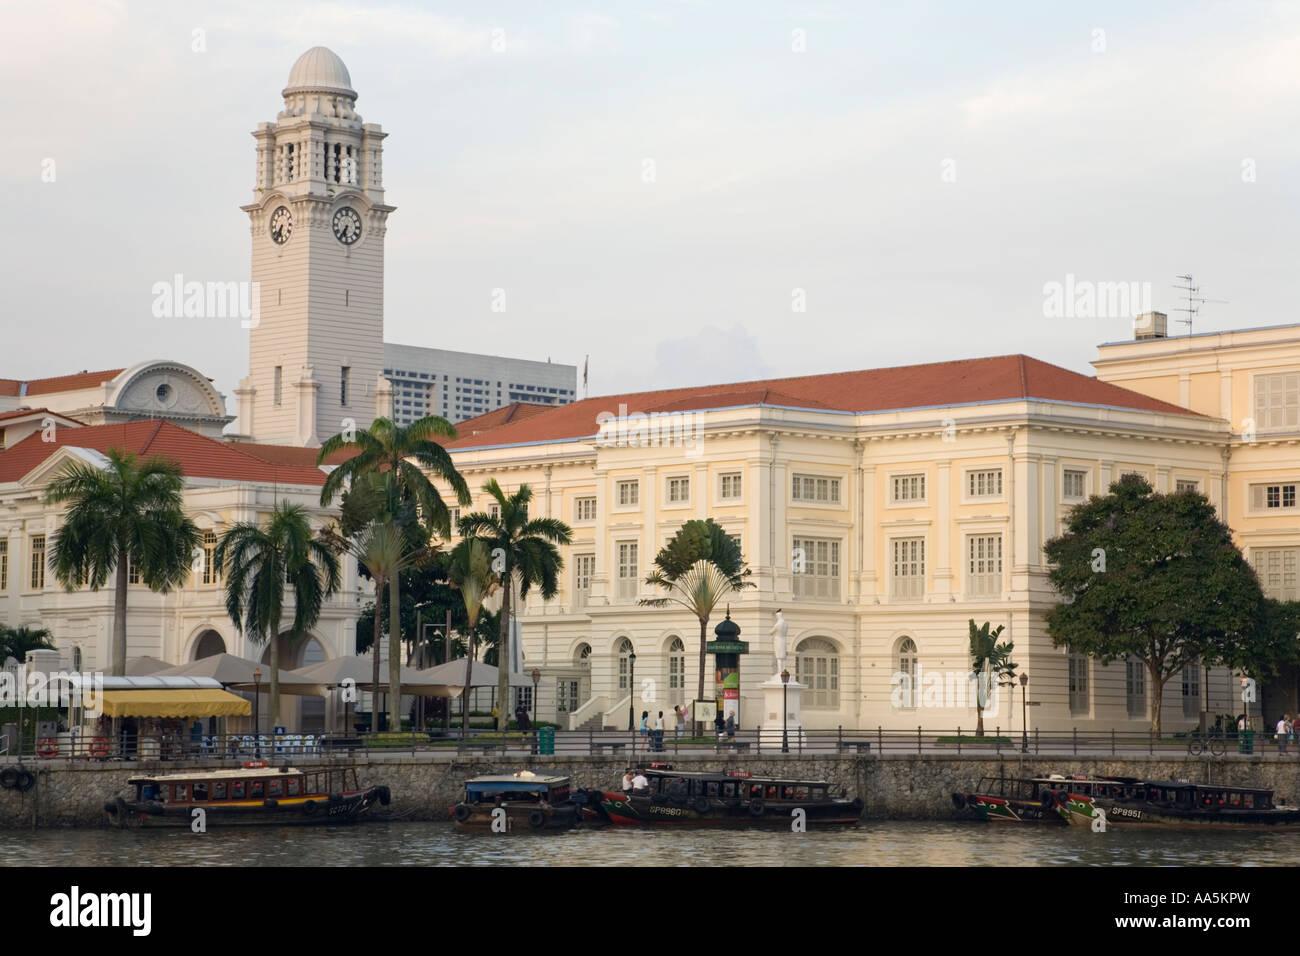 Singapore, Empress Place housing the  Asian Civilisations Museum - Stock Image